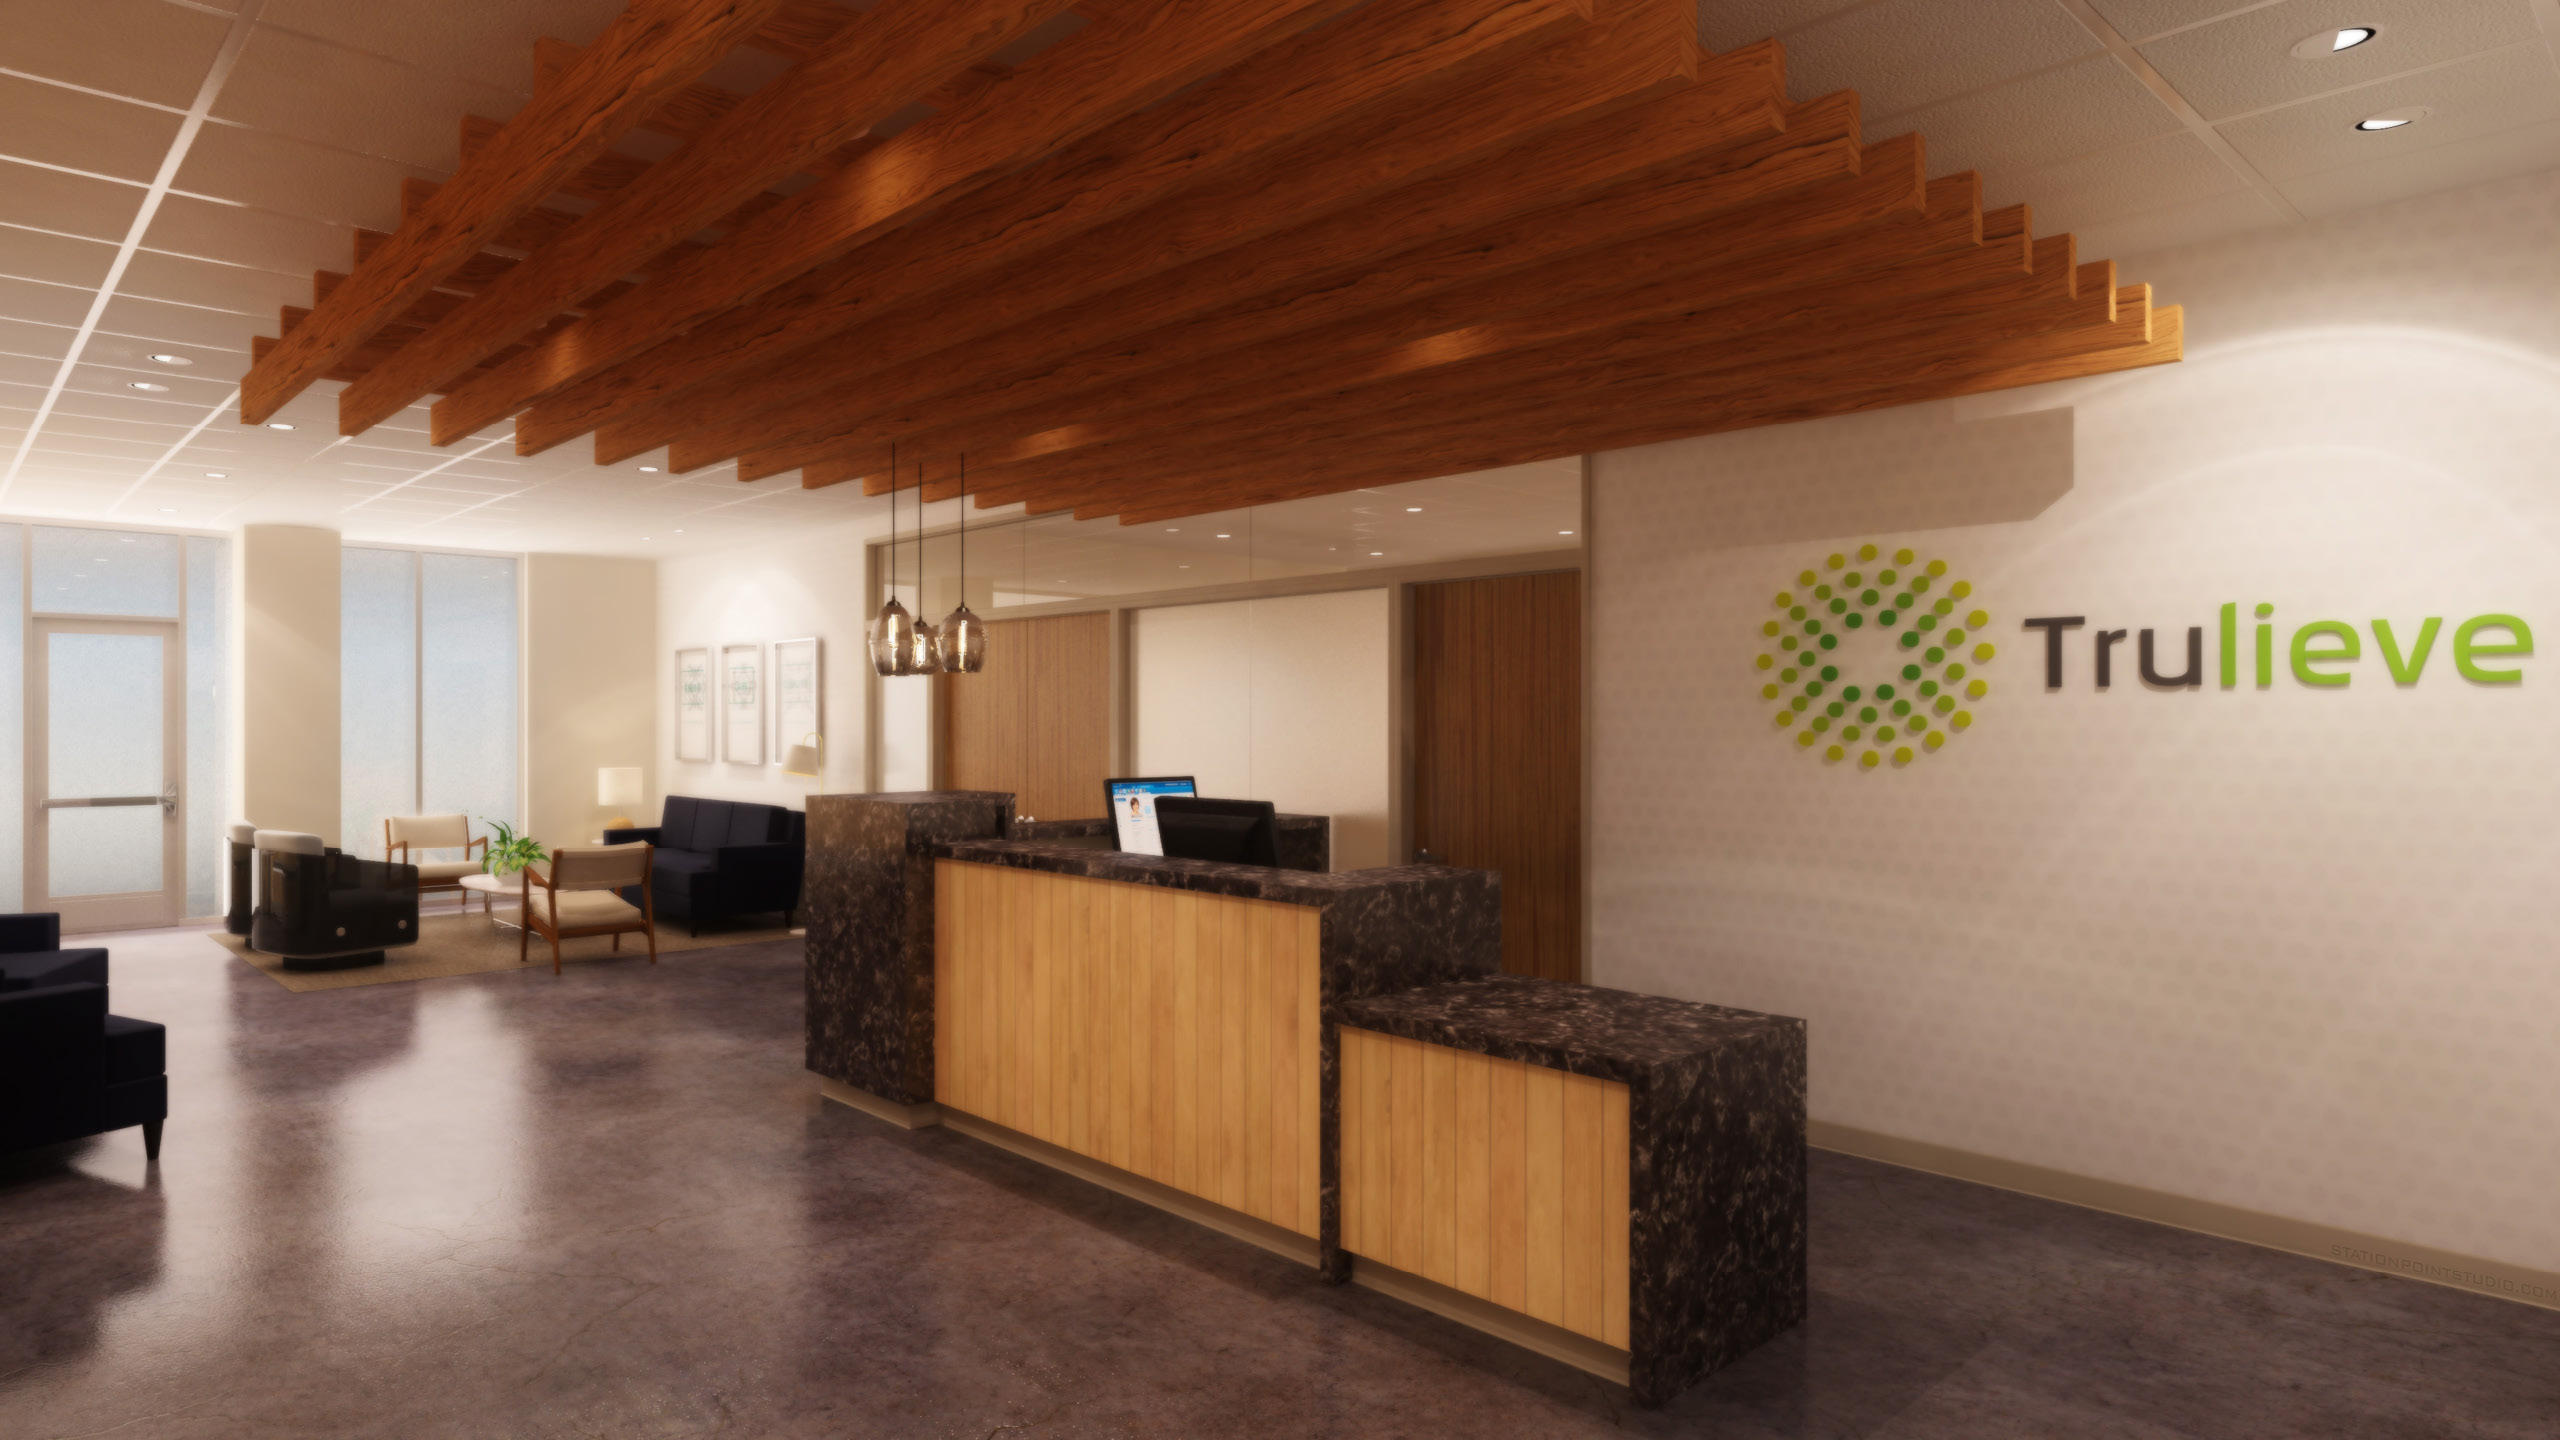 Trulieve Dispensary Design by High Road Design Studio